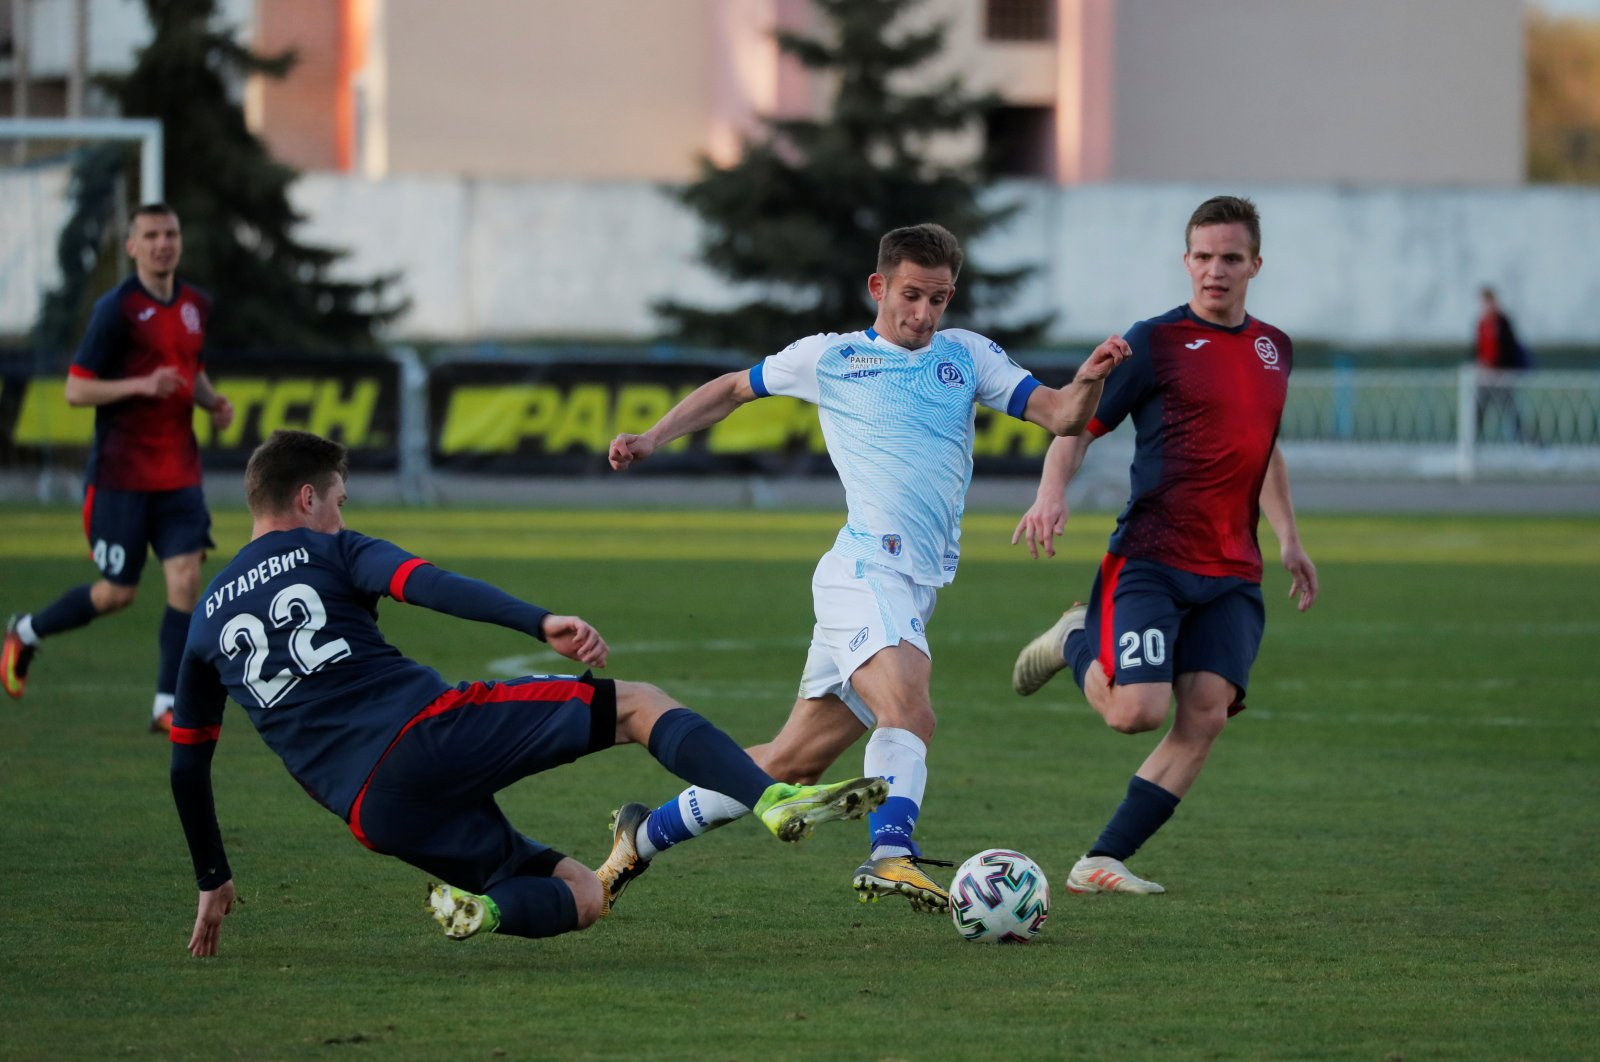 FC Dinamo Minsk's Ivan Bakhar in action with FC Smolevichi's Alex Butarevich, in Borisov, Belarus, Friday, April 24, 2020. (Reuters Photo)